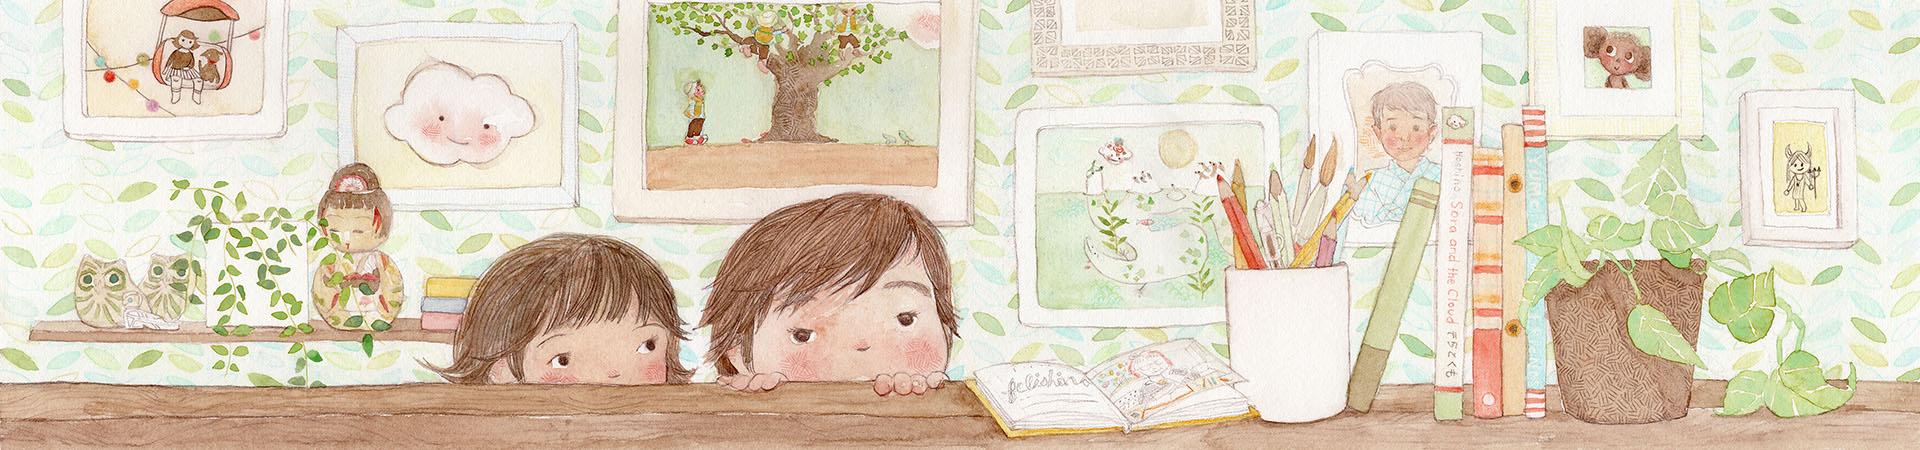 Felishino - Childrens Books and other illustrations by Felisha Hoshino